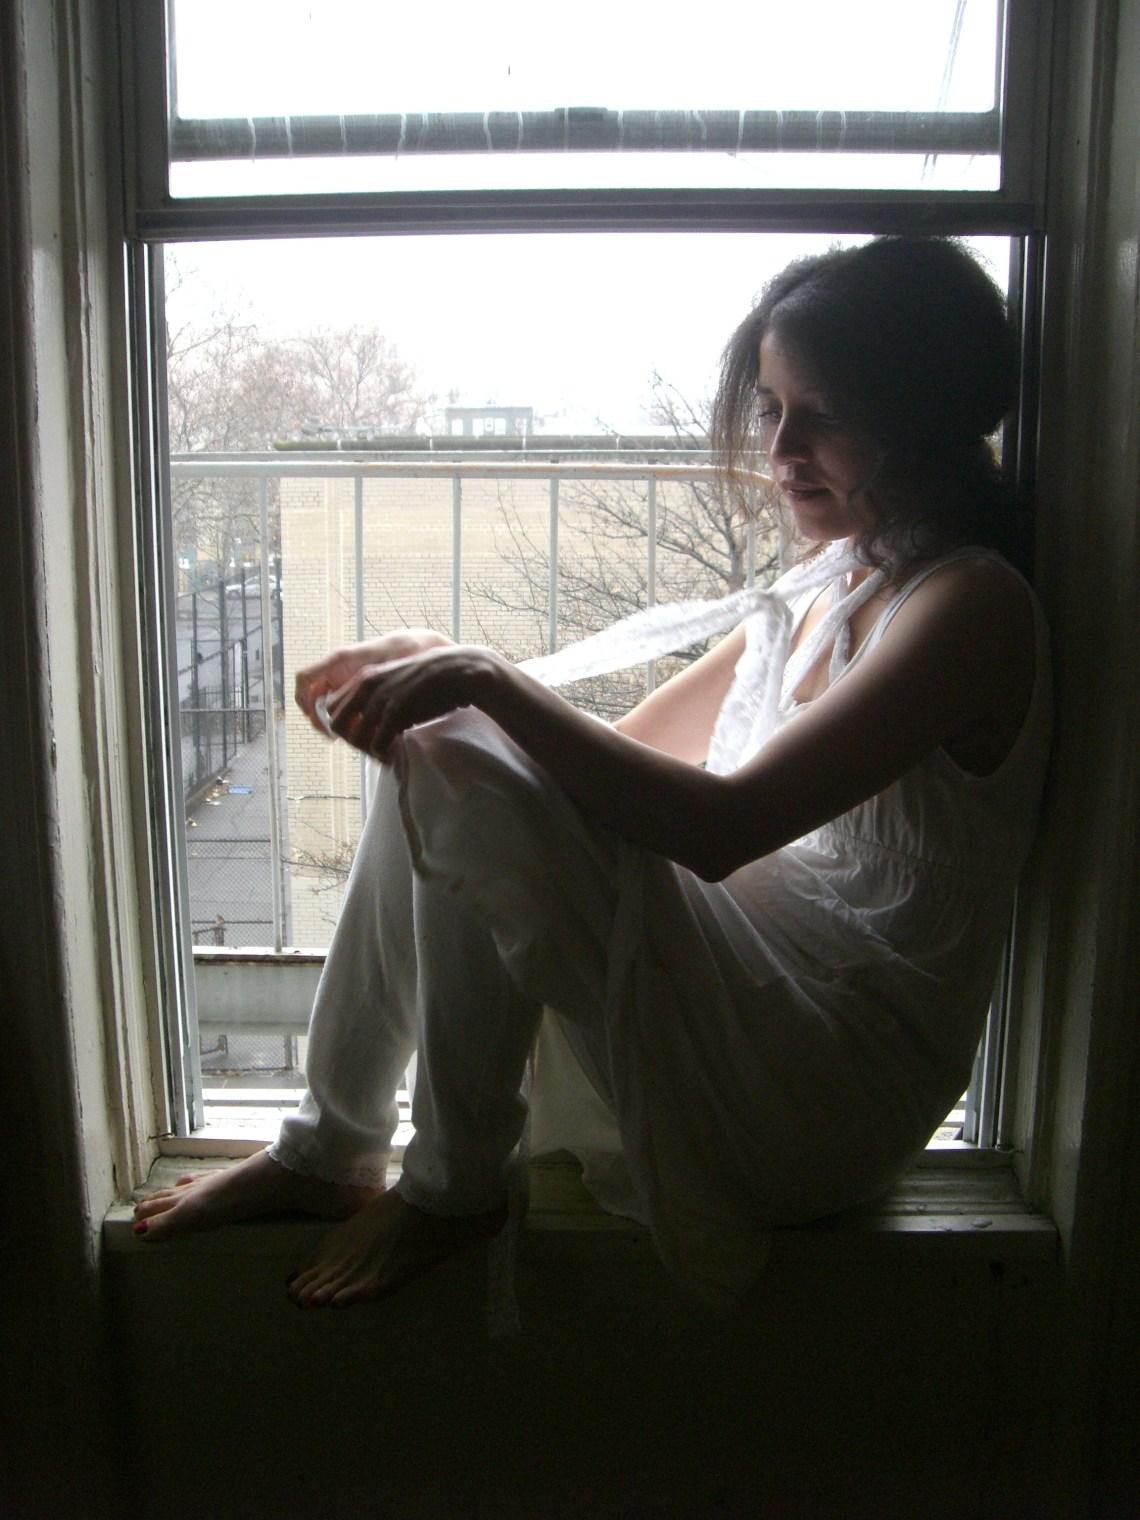 Michelle Spaulding